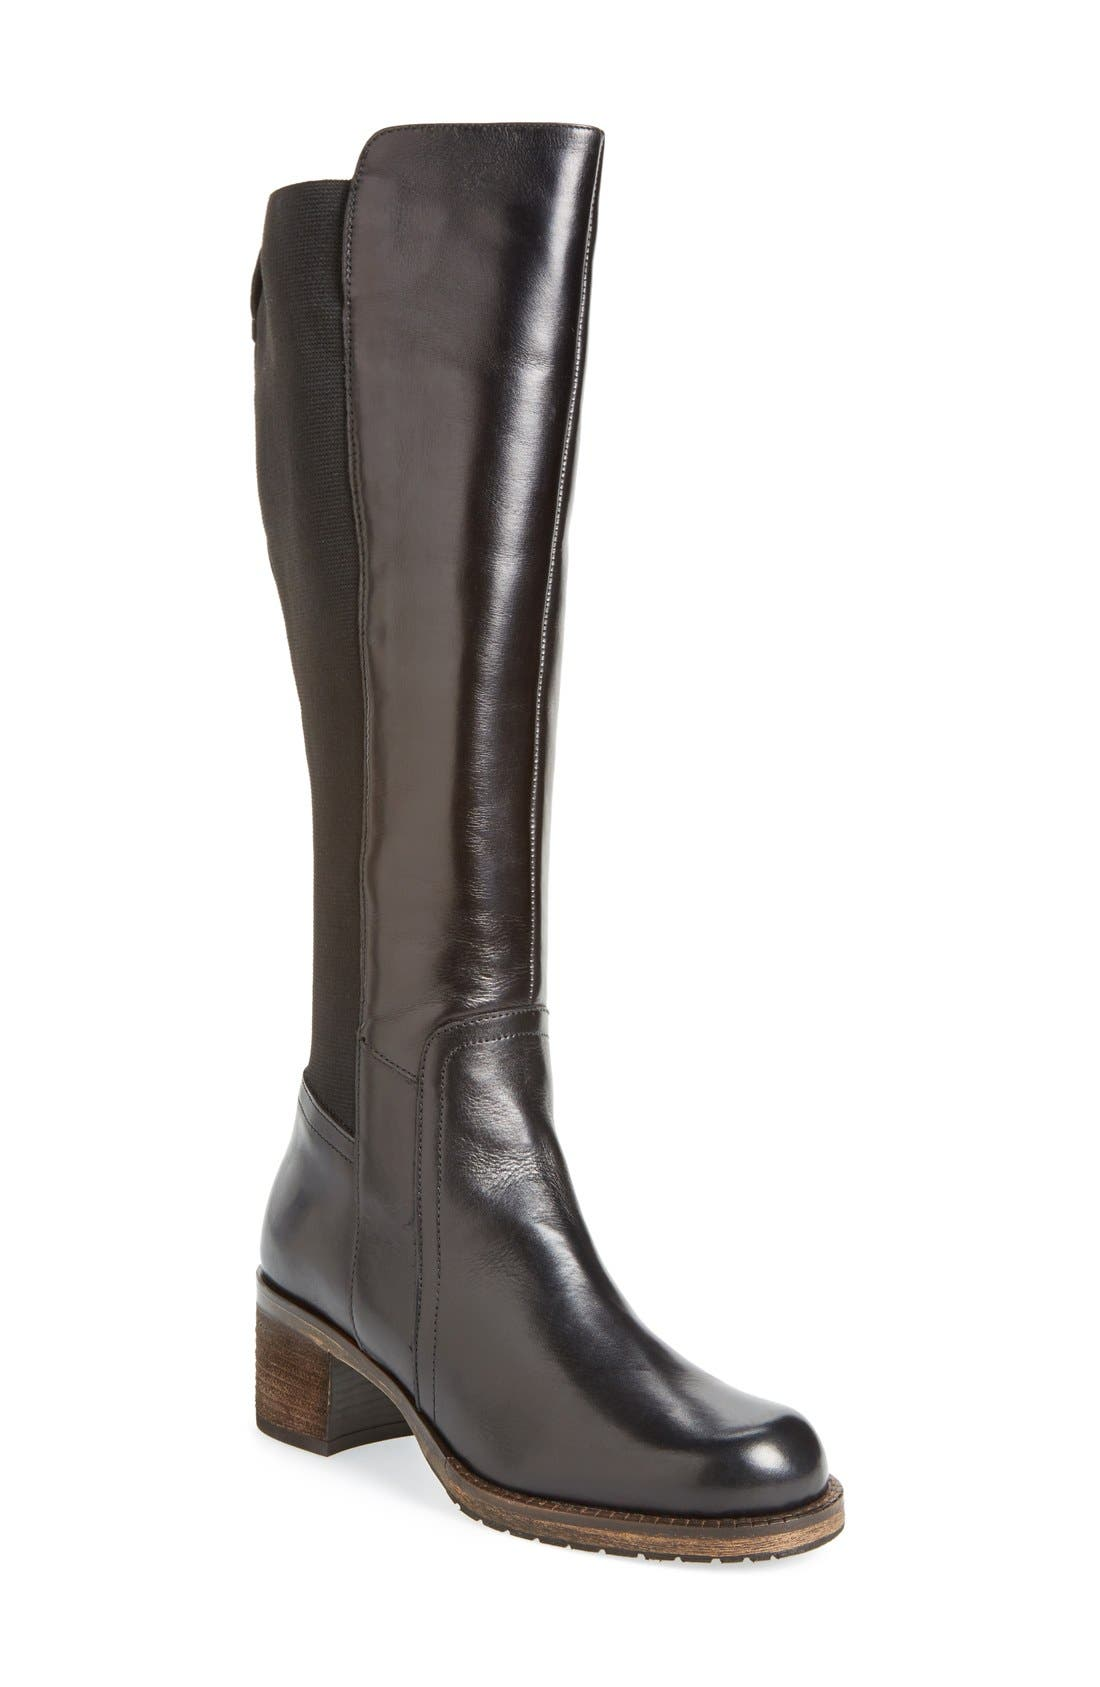 Alternate Image 1 Selected - Dune London 'Tarra' Knee High Boot (Women)